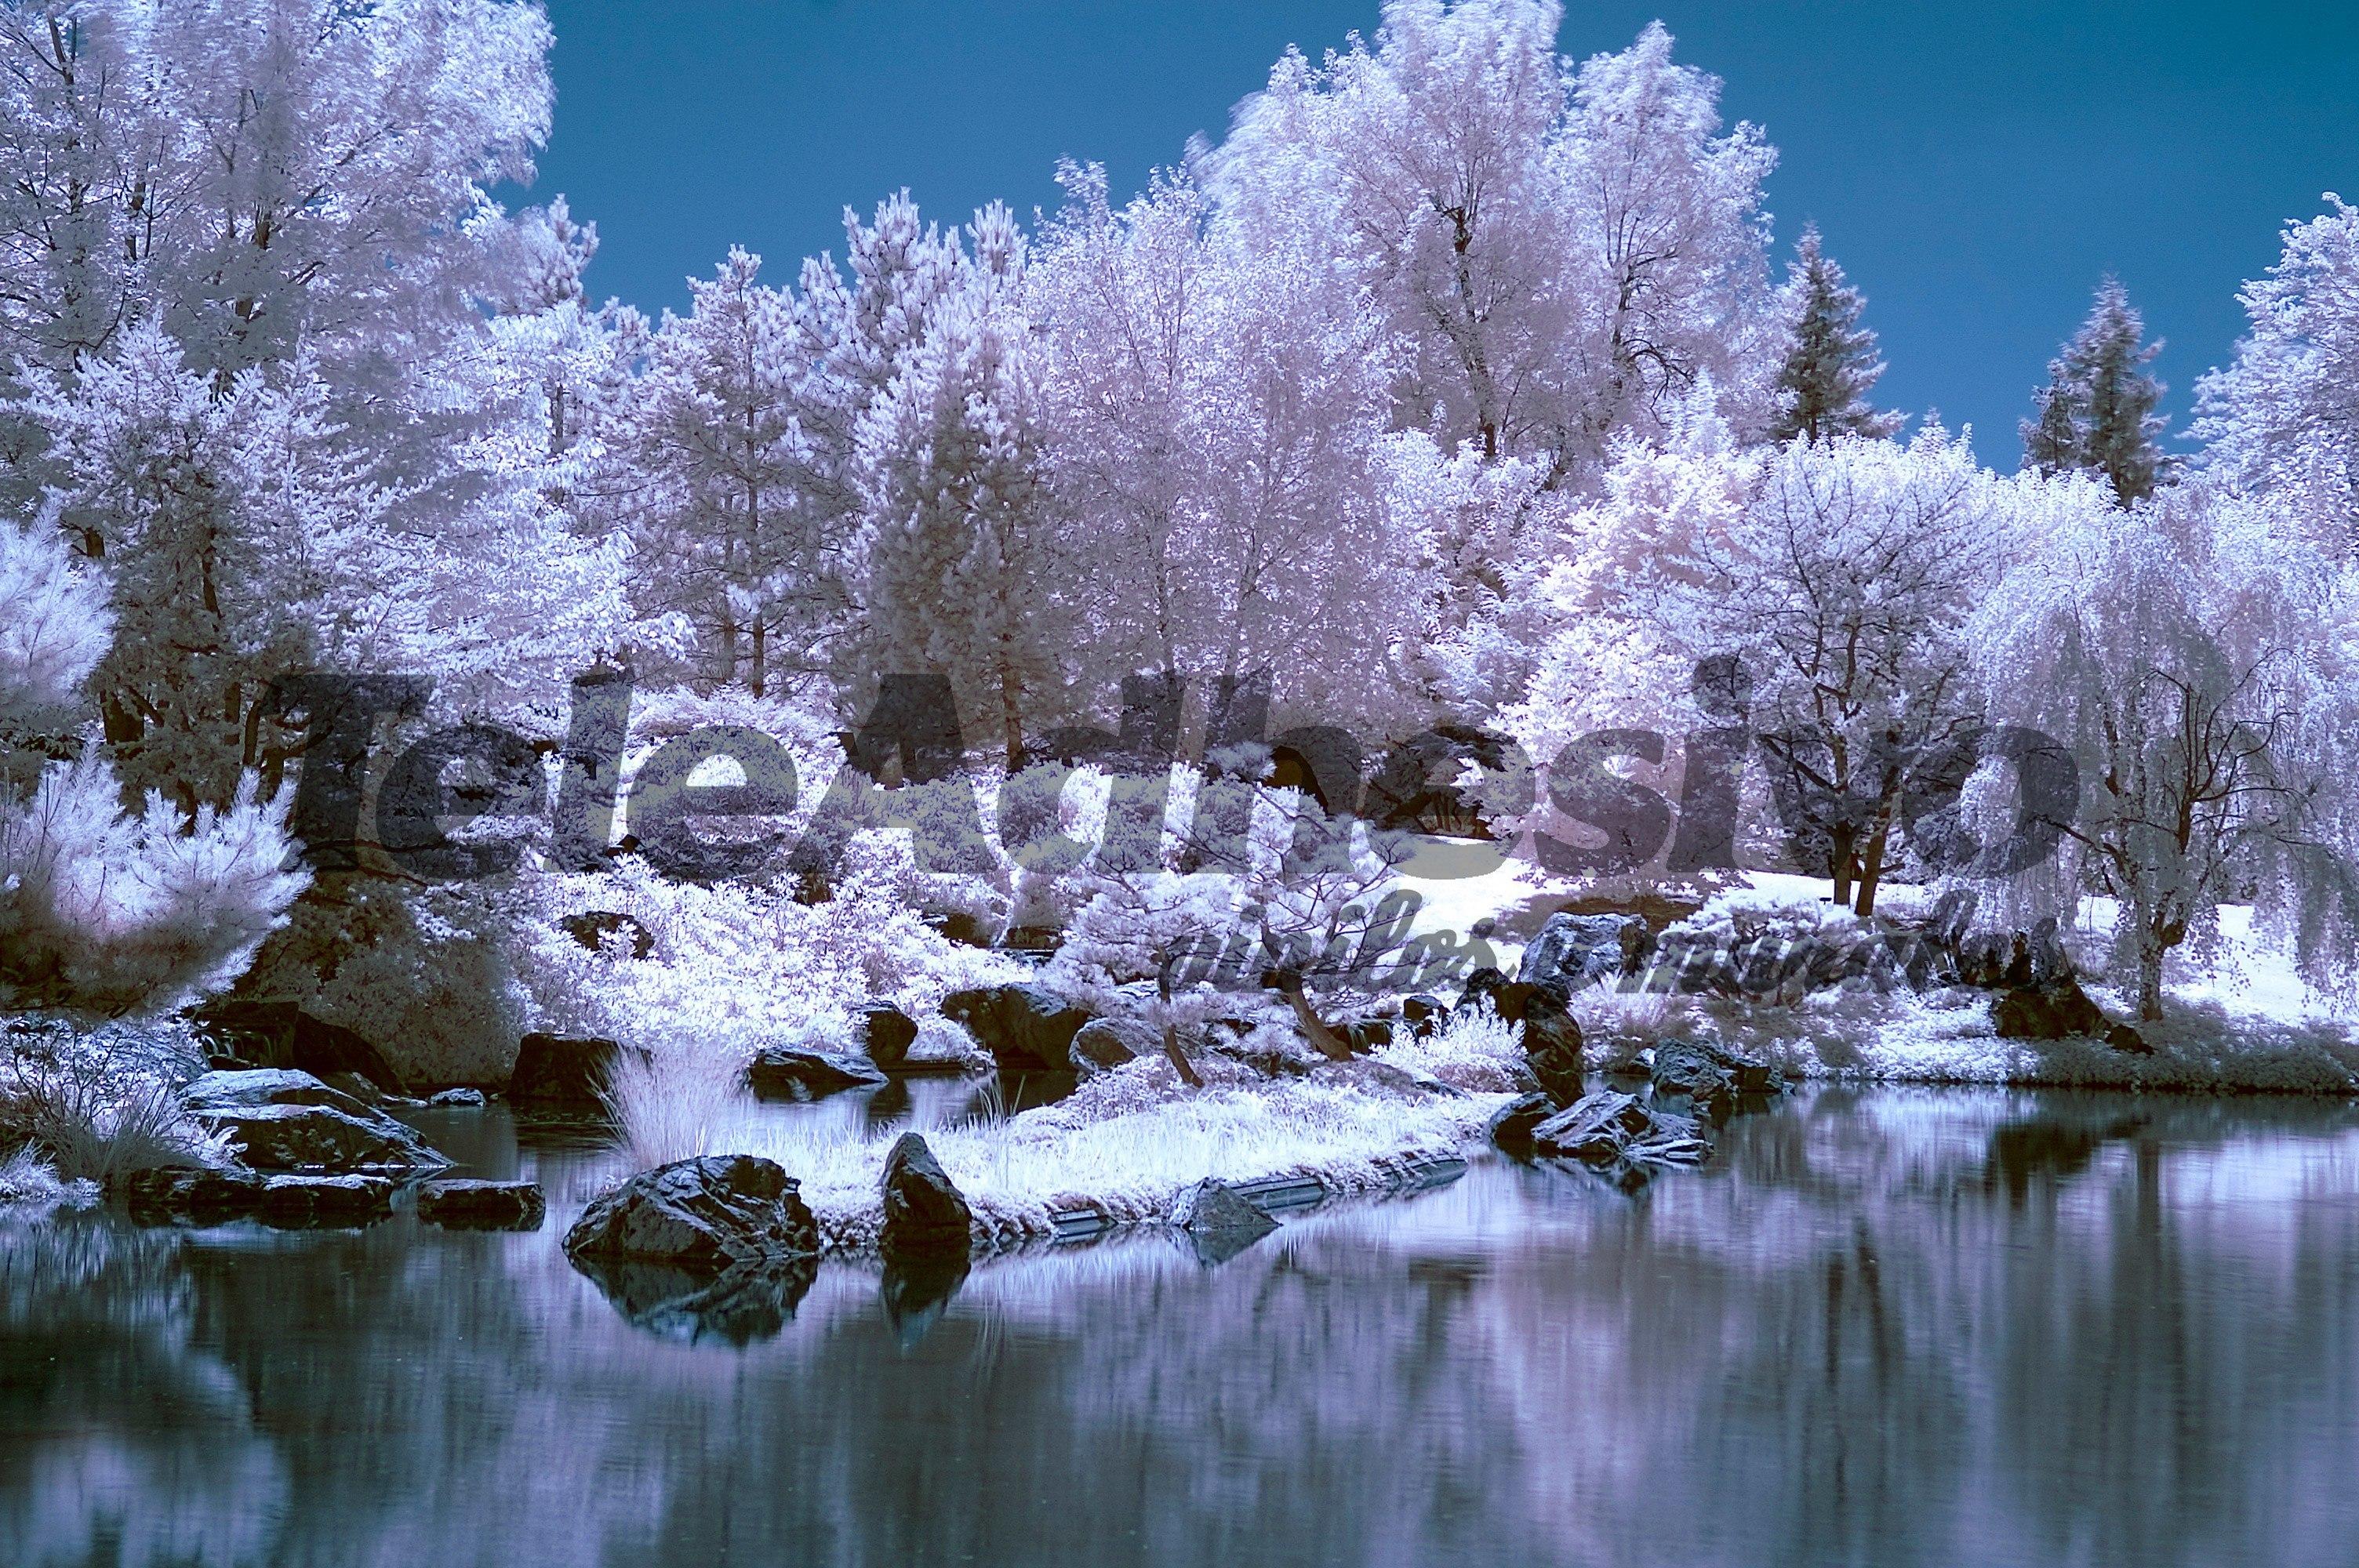 Fototapeten: Landschaft 37